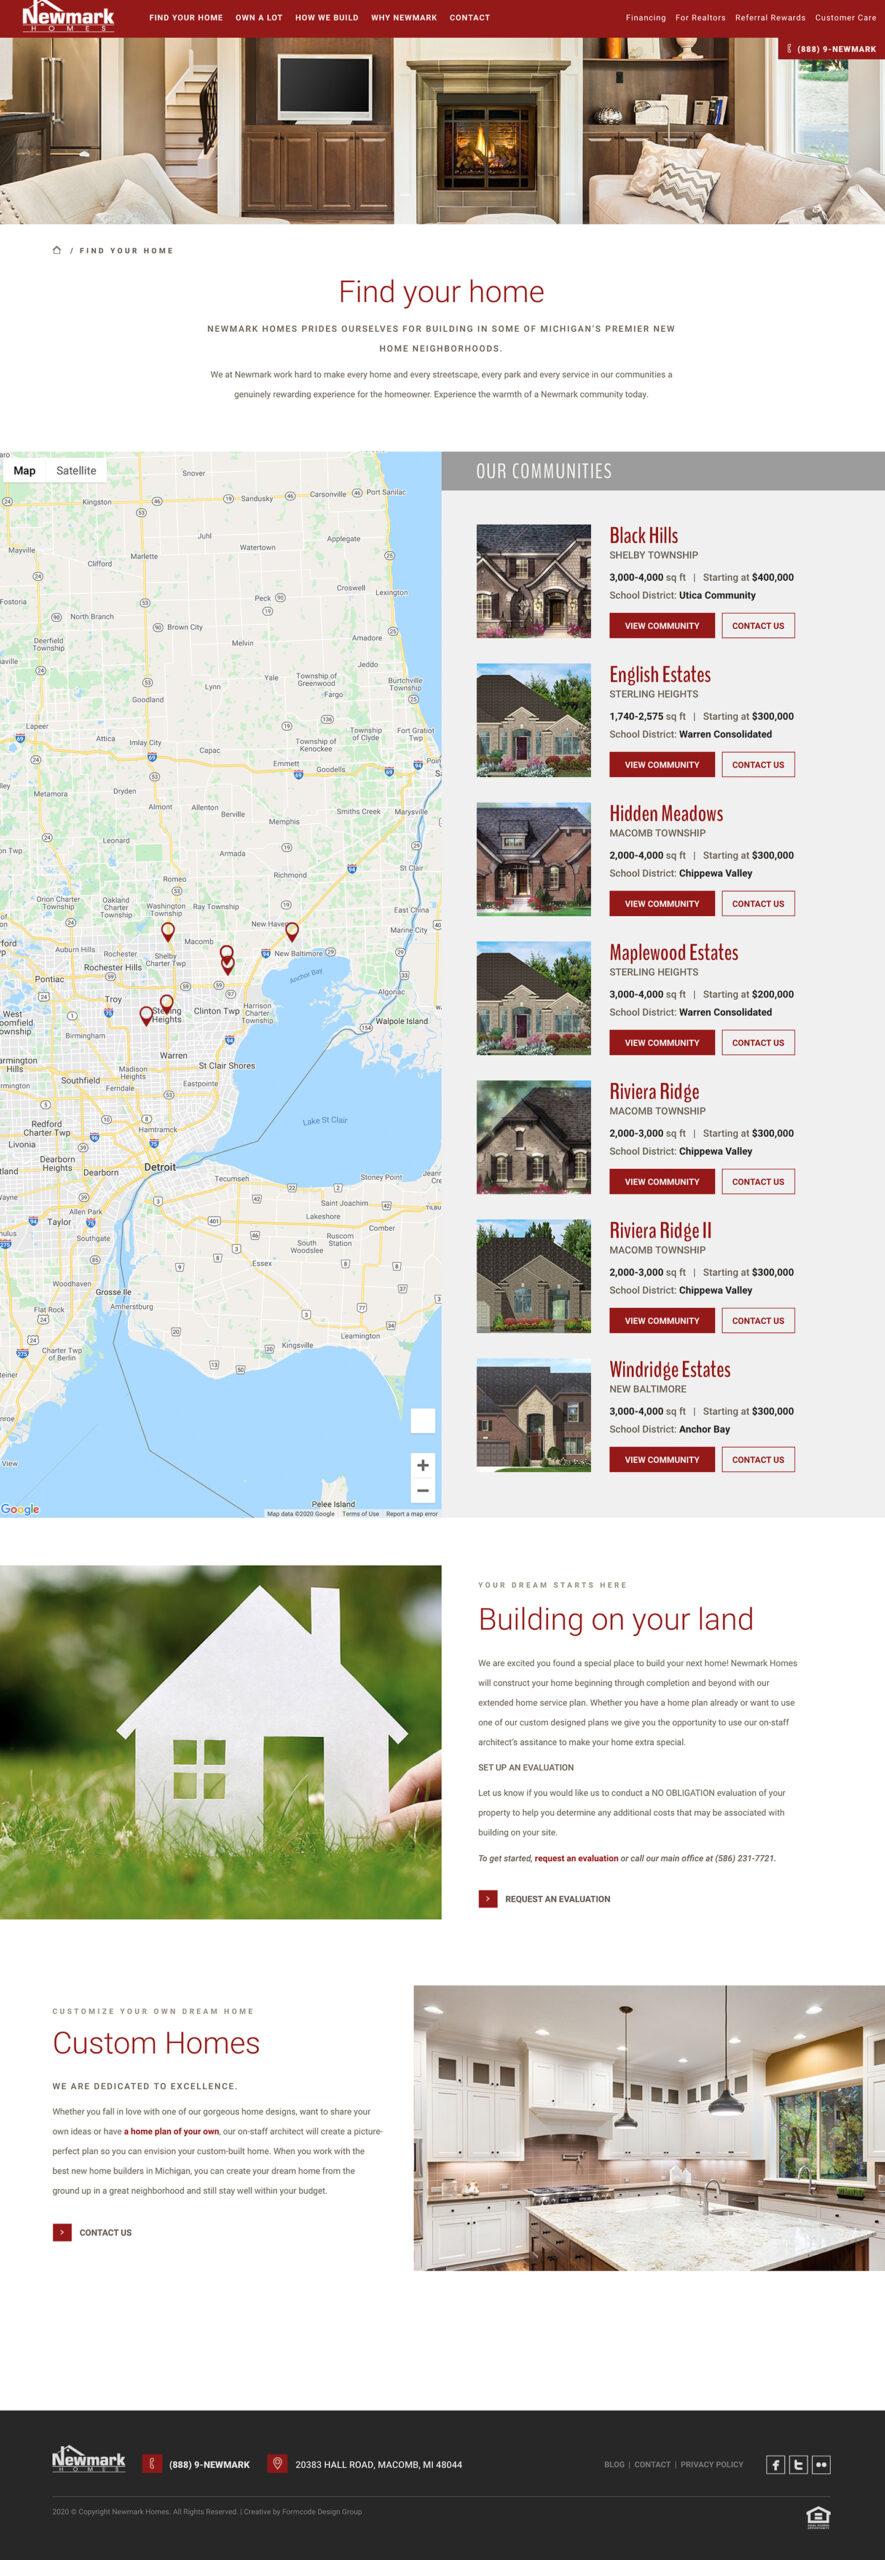 Homebuilder Homes Listing example